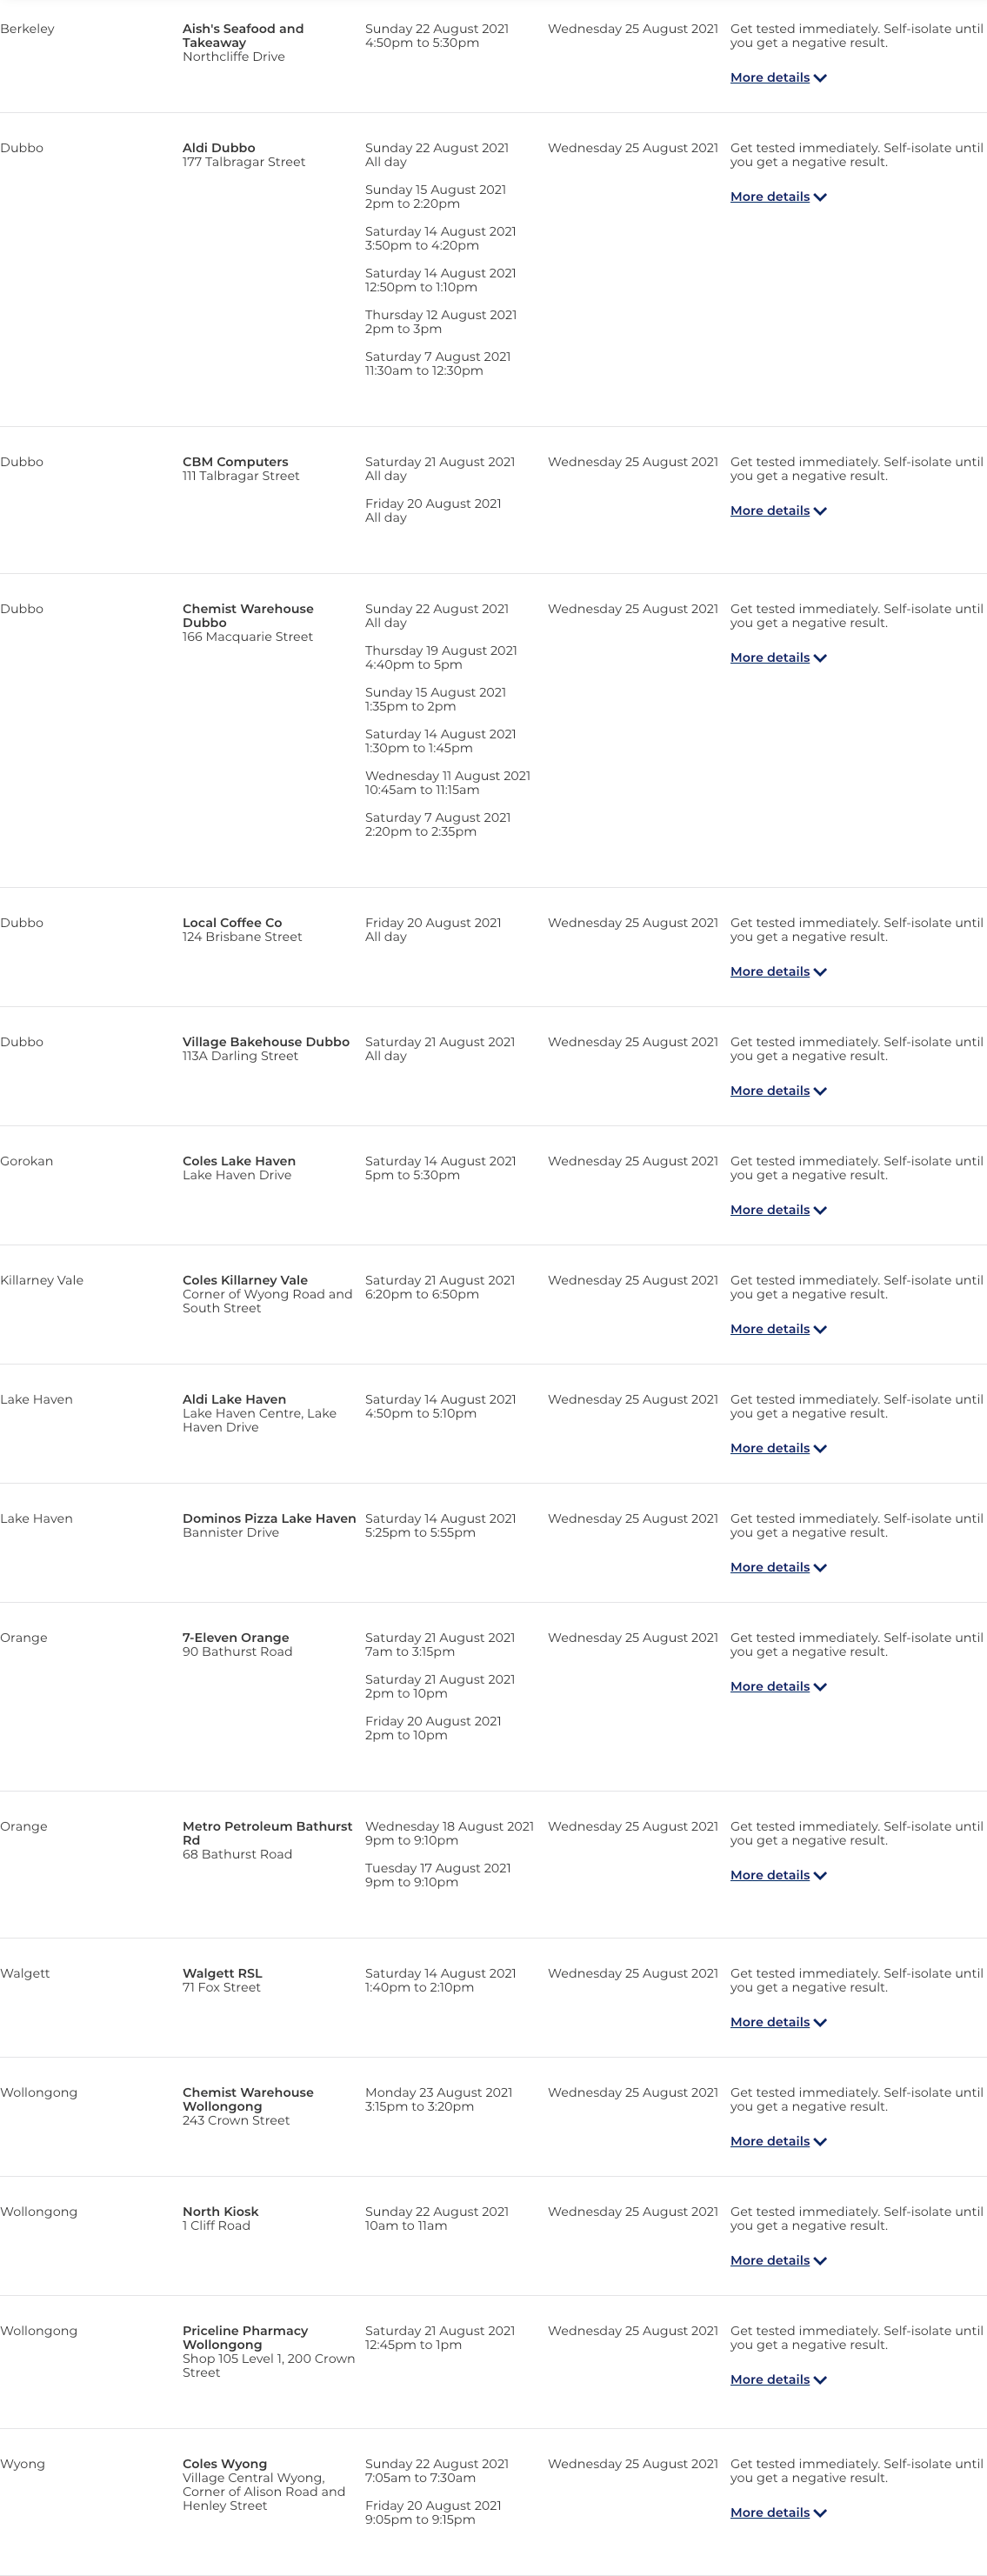 www.nsw.gov.au_covid-19_nsw-covid-19-case-locations_case-locations (5).png